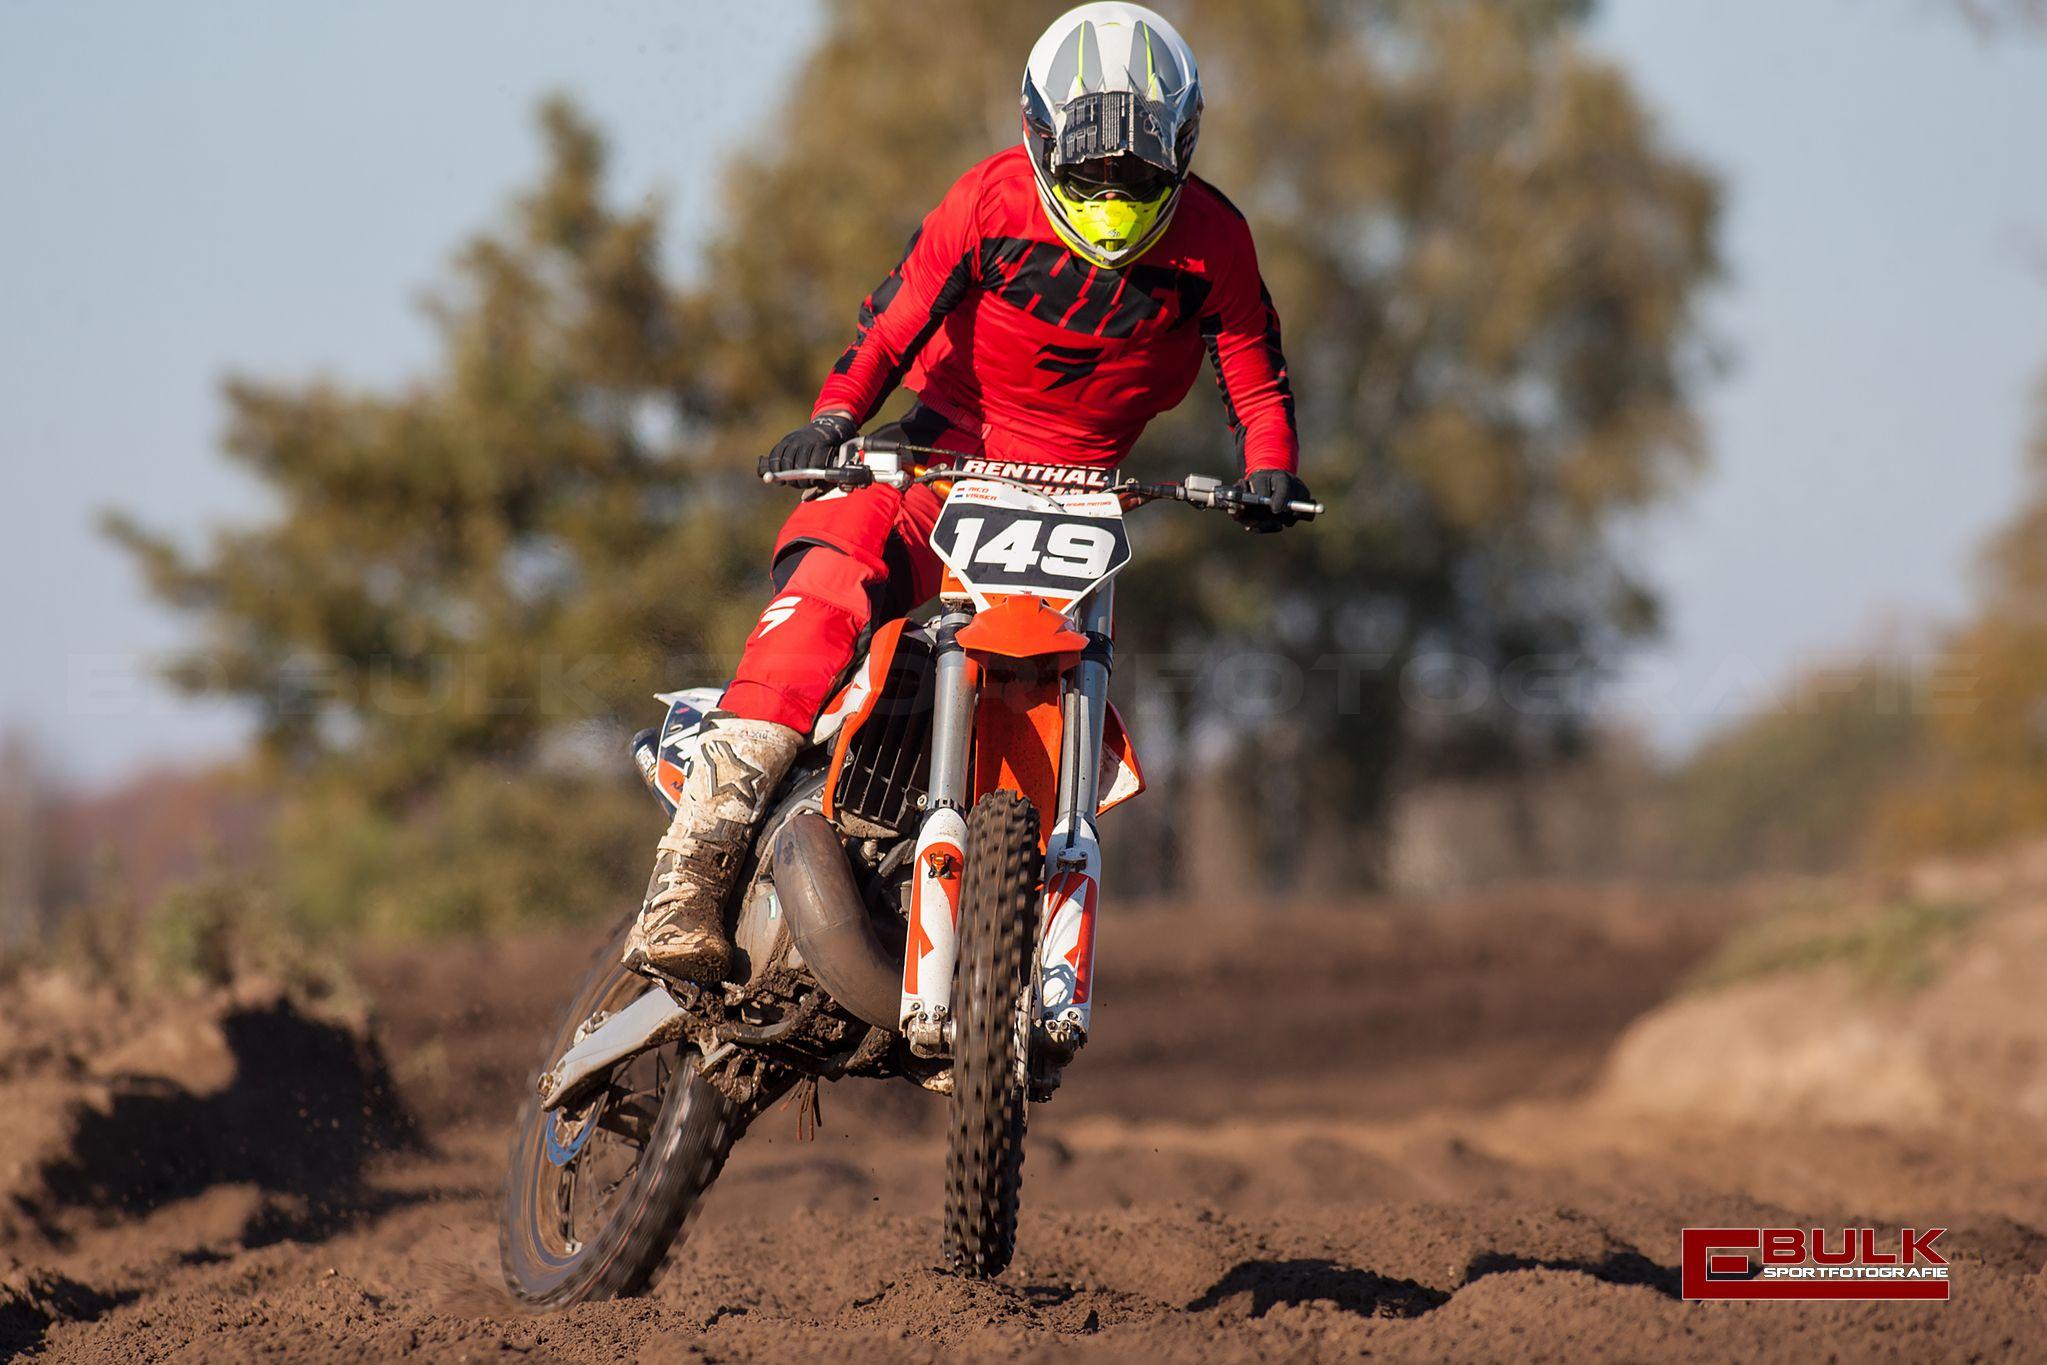 ebs_1077-ed_bulk_sportfotografie